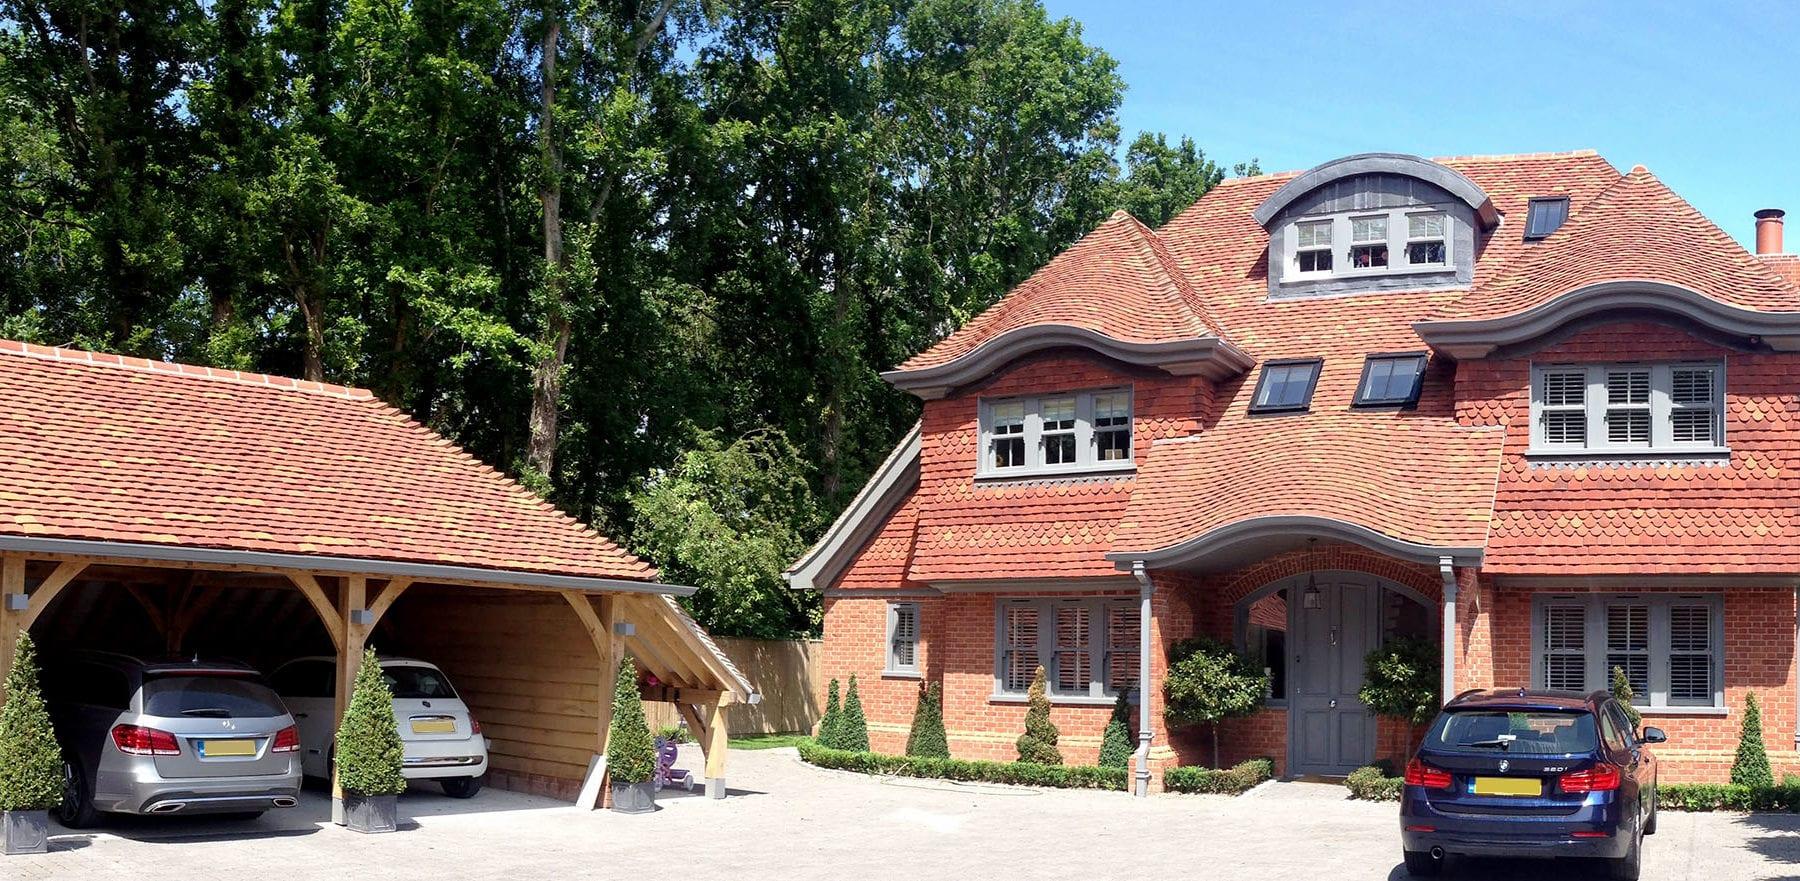 Lifestiles - Handmade Bespoke Clay Roof Tiles - Chichester, England 2